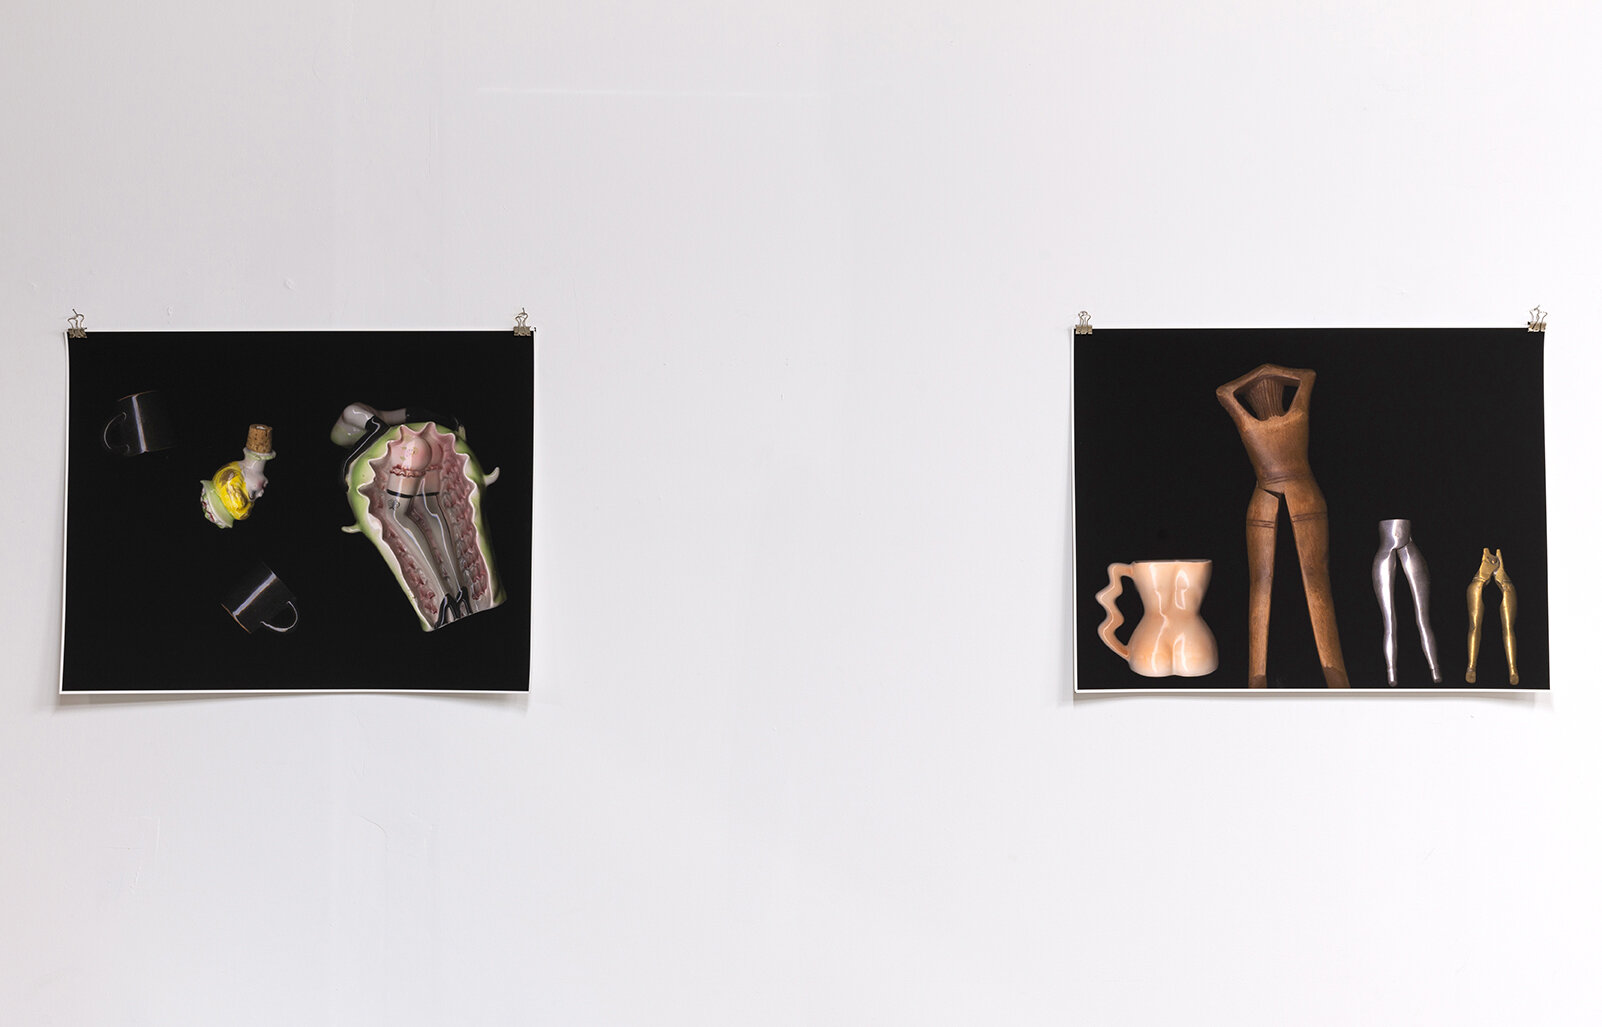 Portia Munson, Installation view